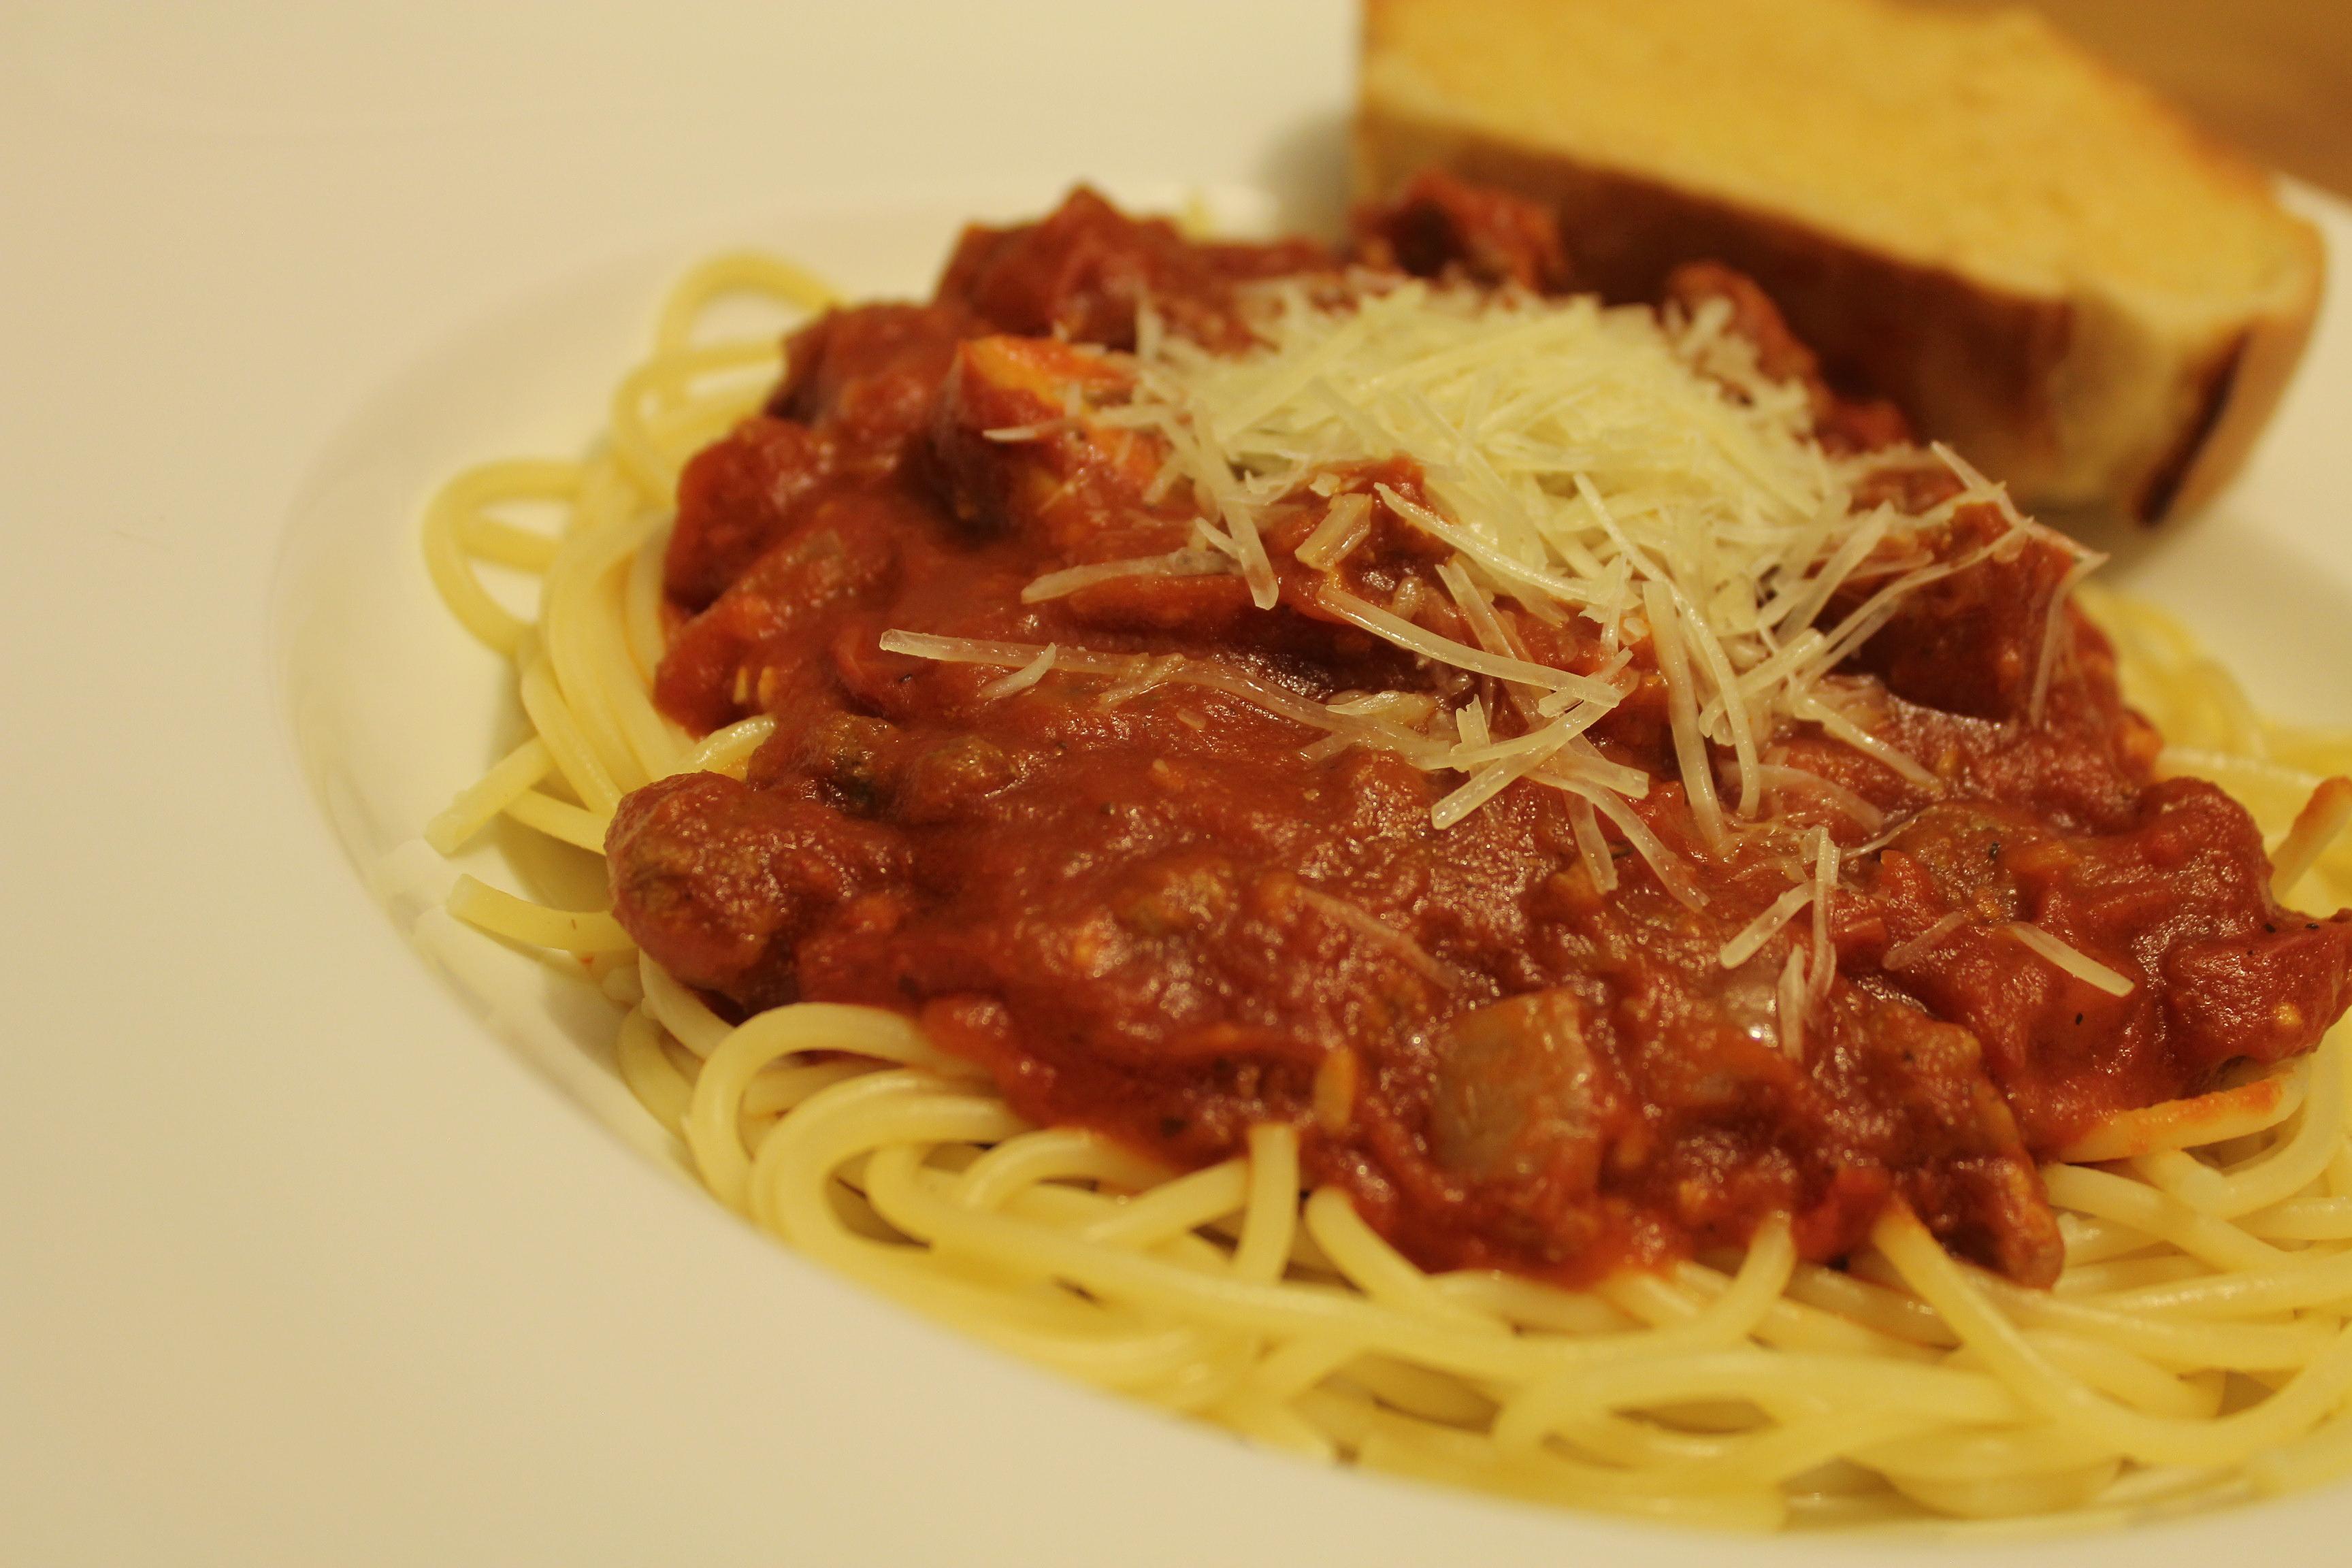 Sunday dinner: Spicy skillet chicken spaghetti  |Spicy Italian Spaghetti